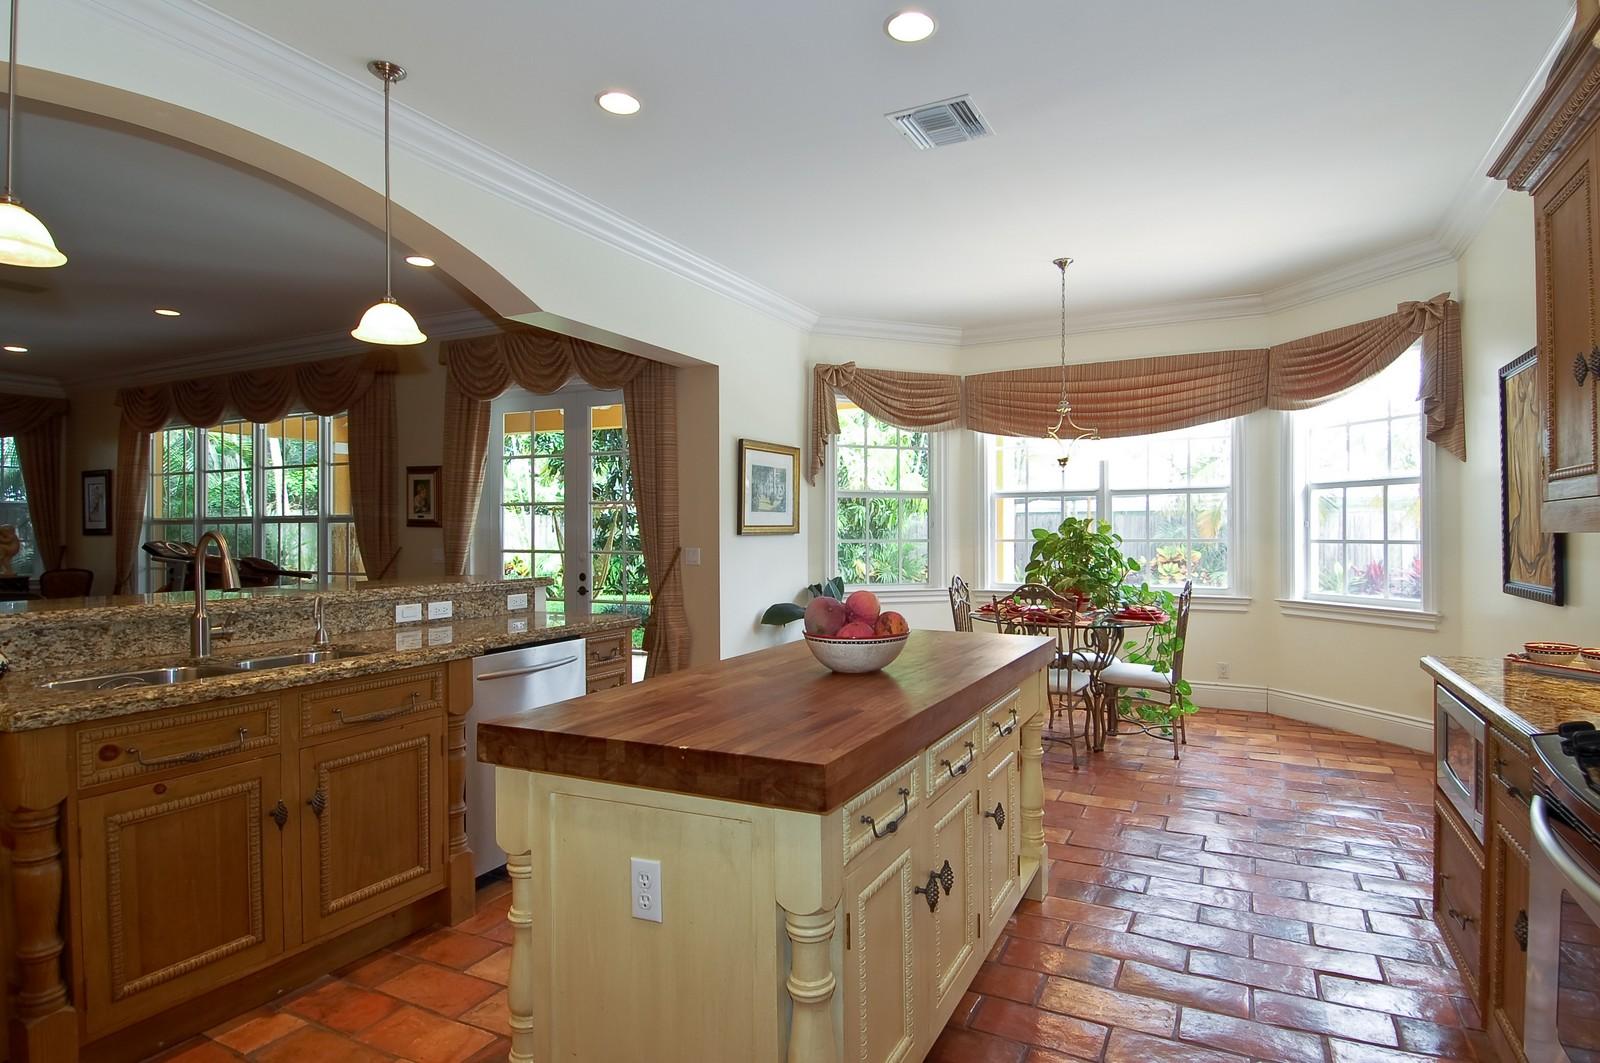 Real Estate Photography - 355 NE 3rd Ct, Boca Raton, FL, 33432 - Kitchen / Breakfast Room